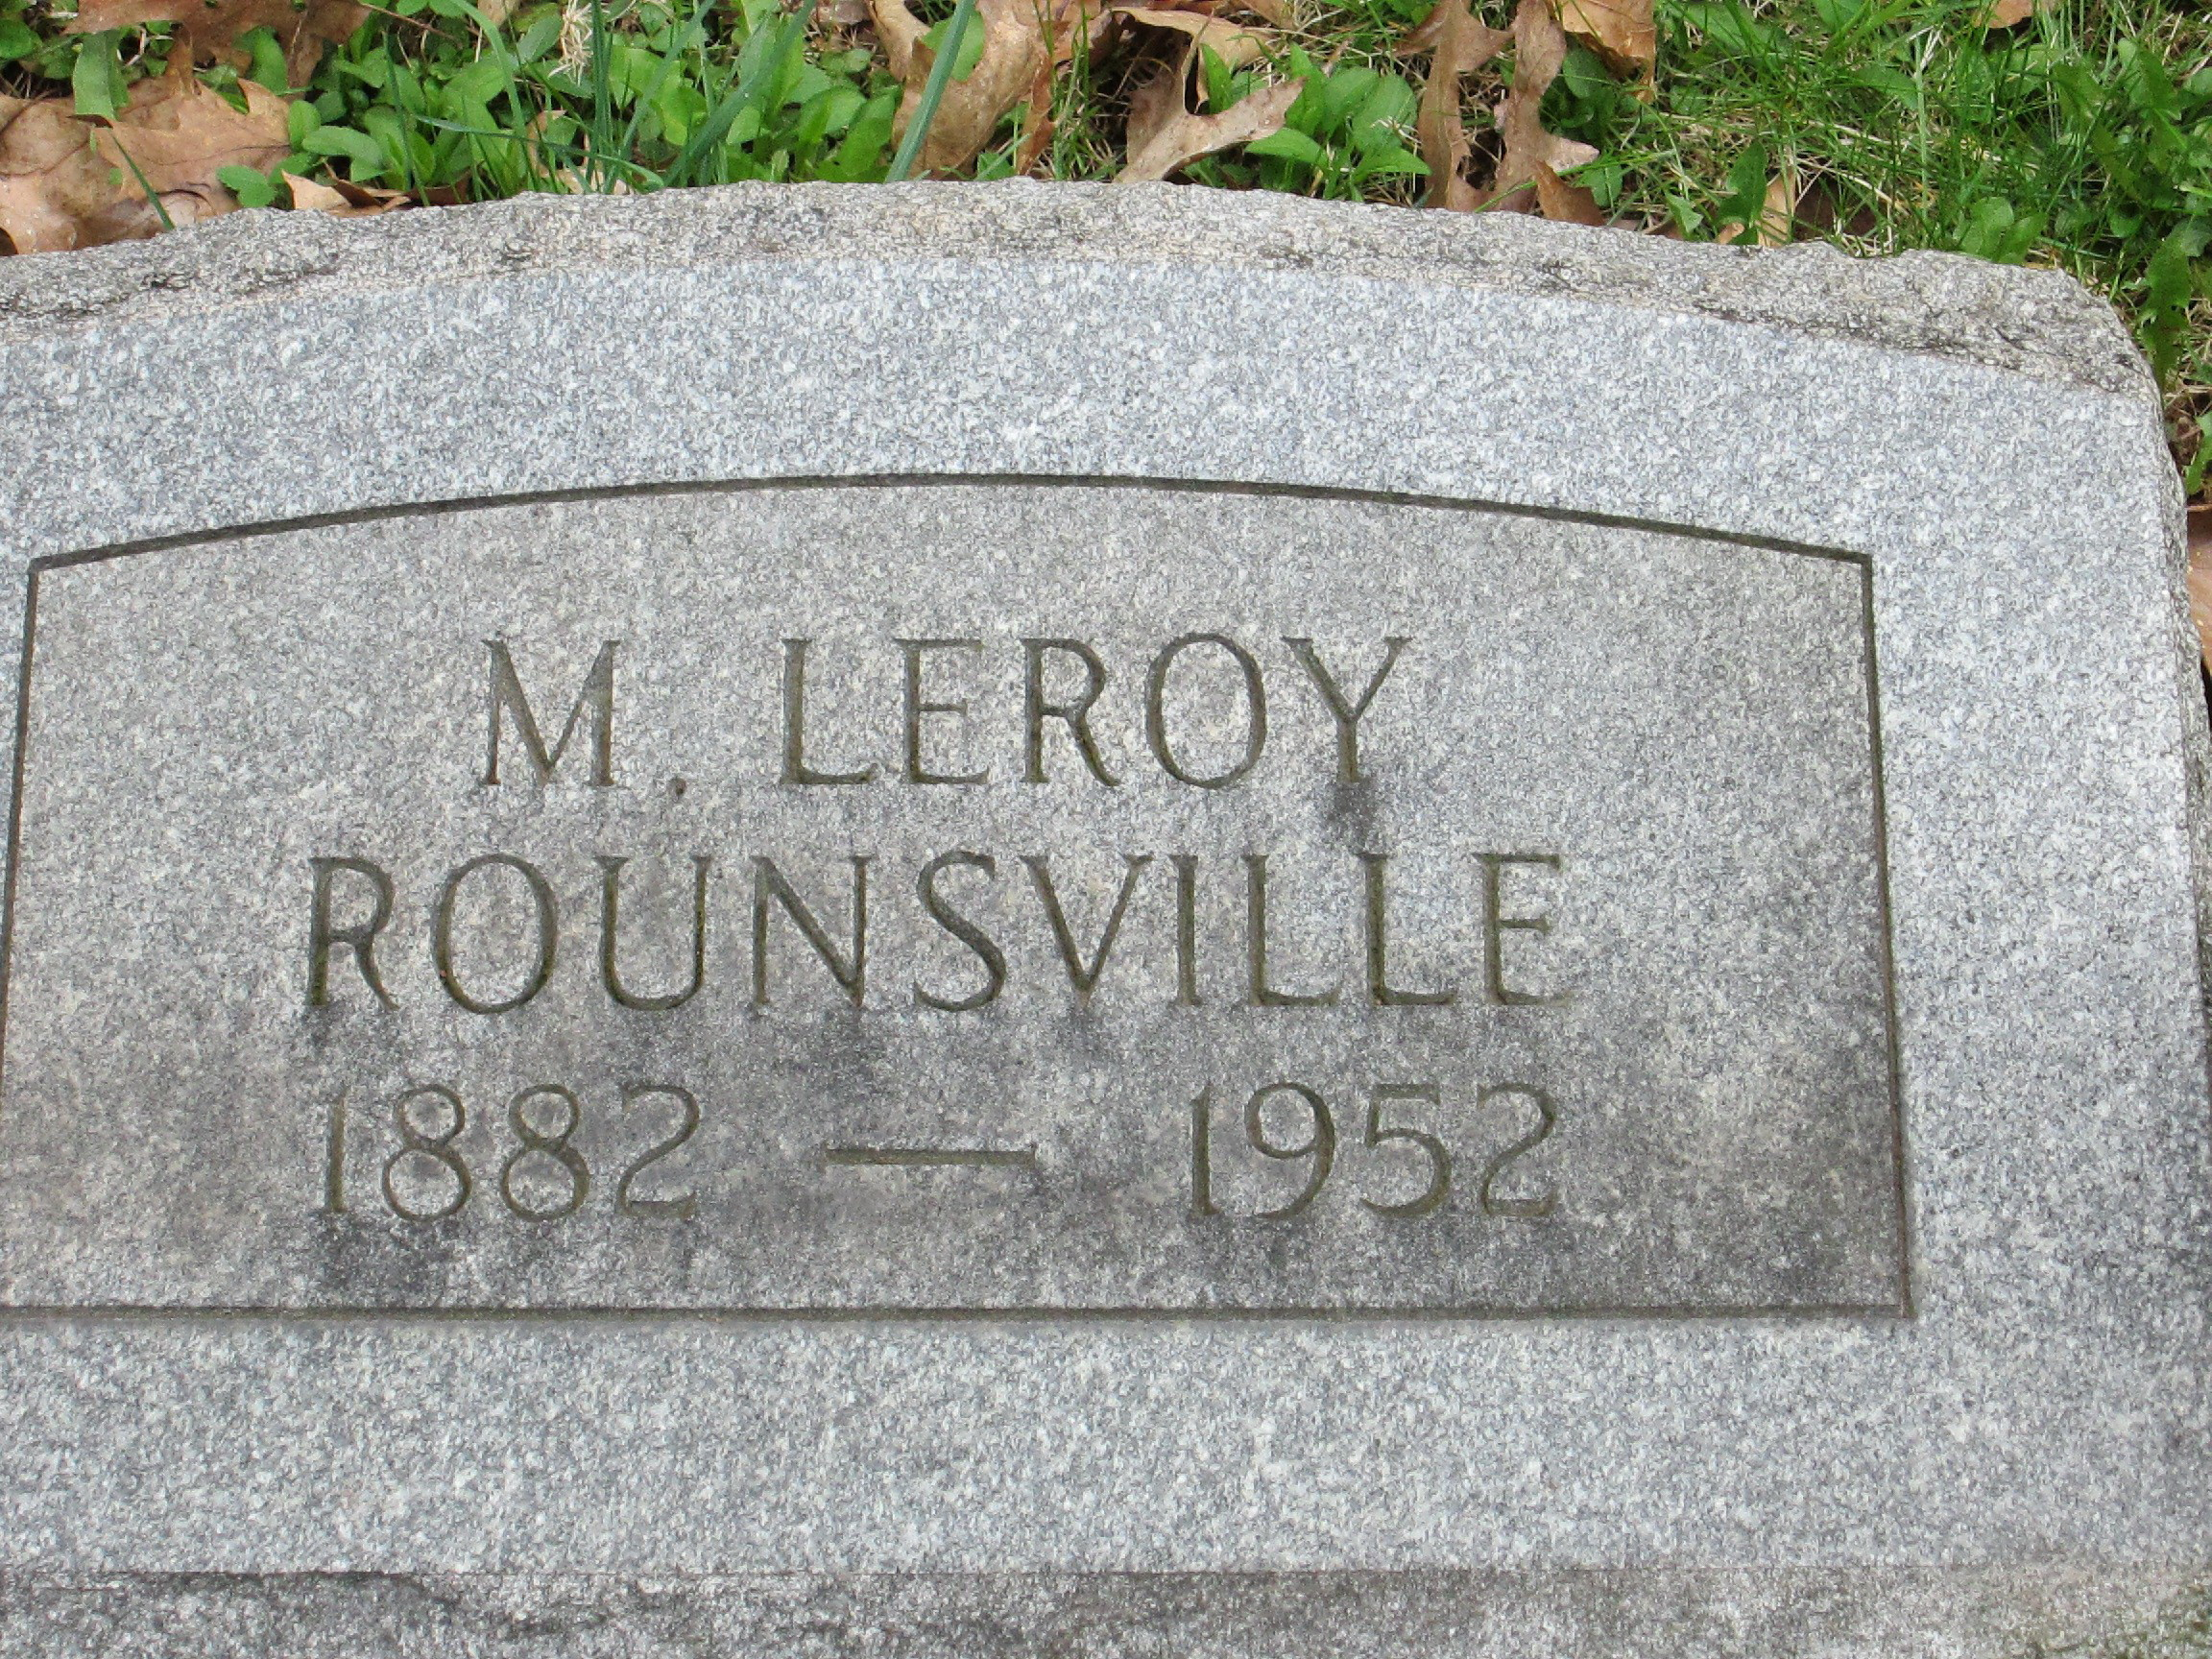 Henry Leroy Rounsville